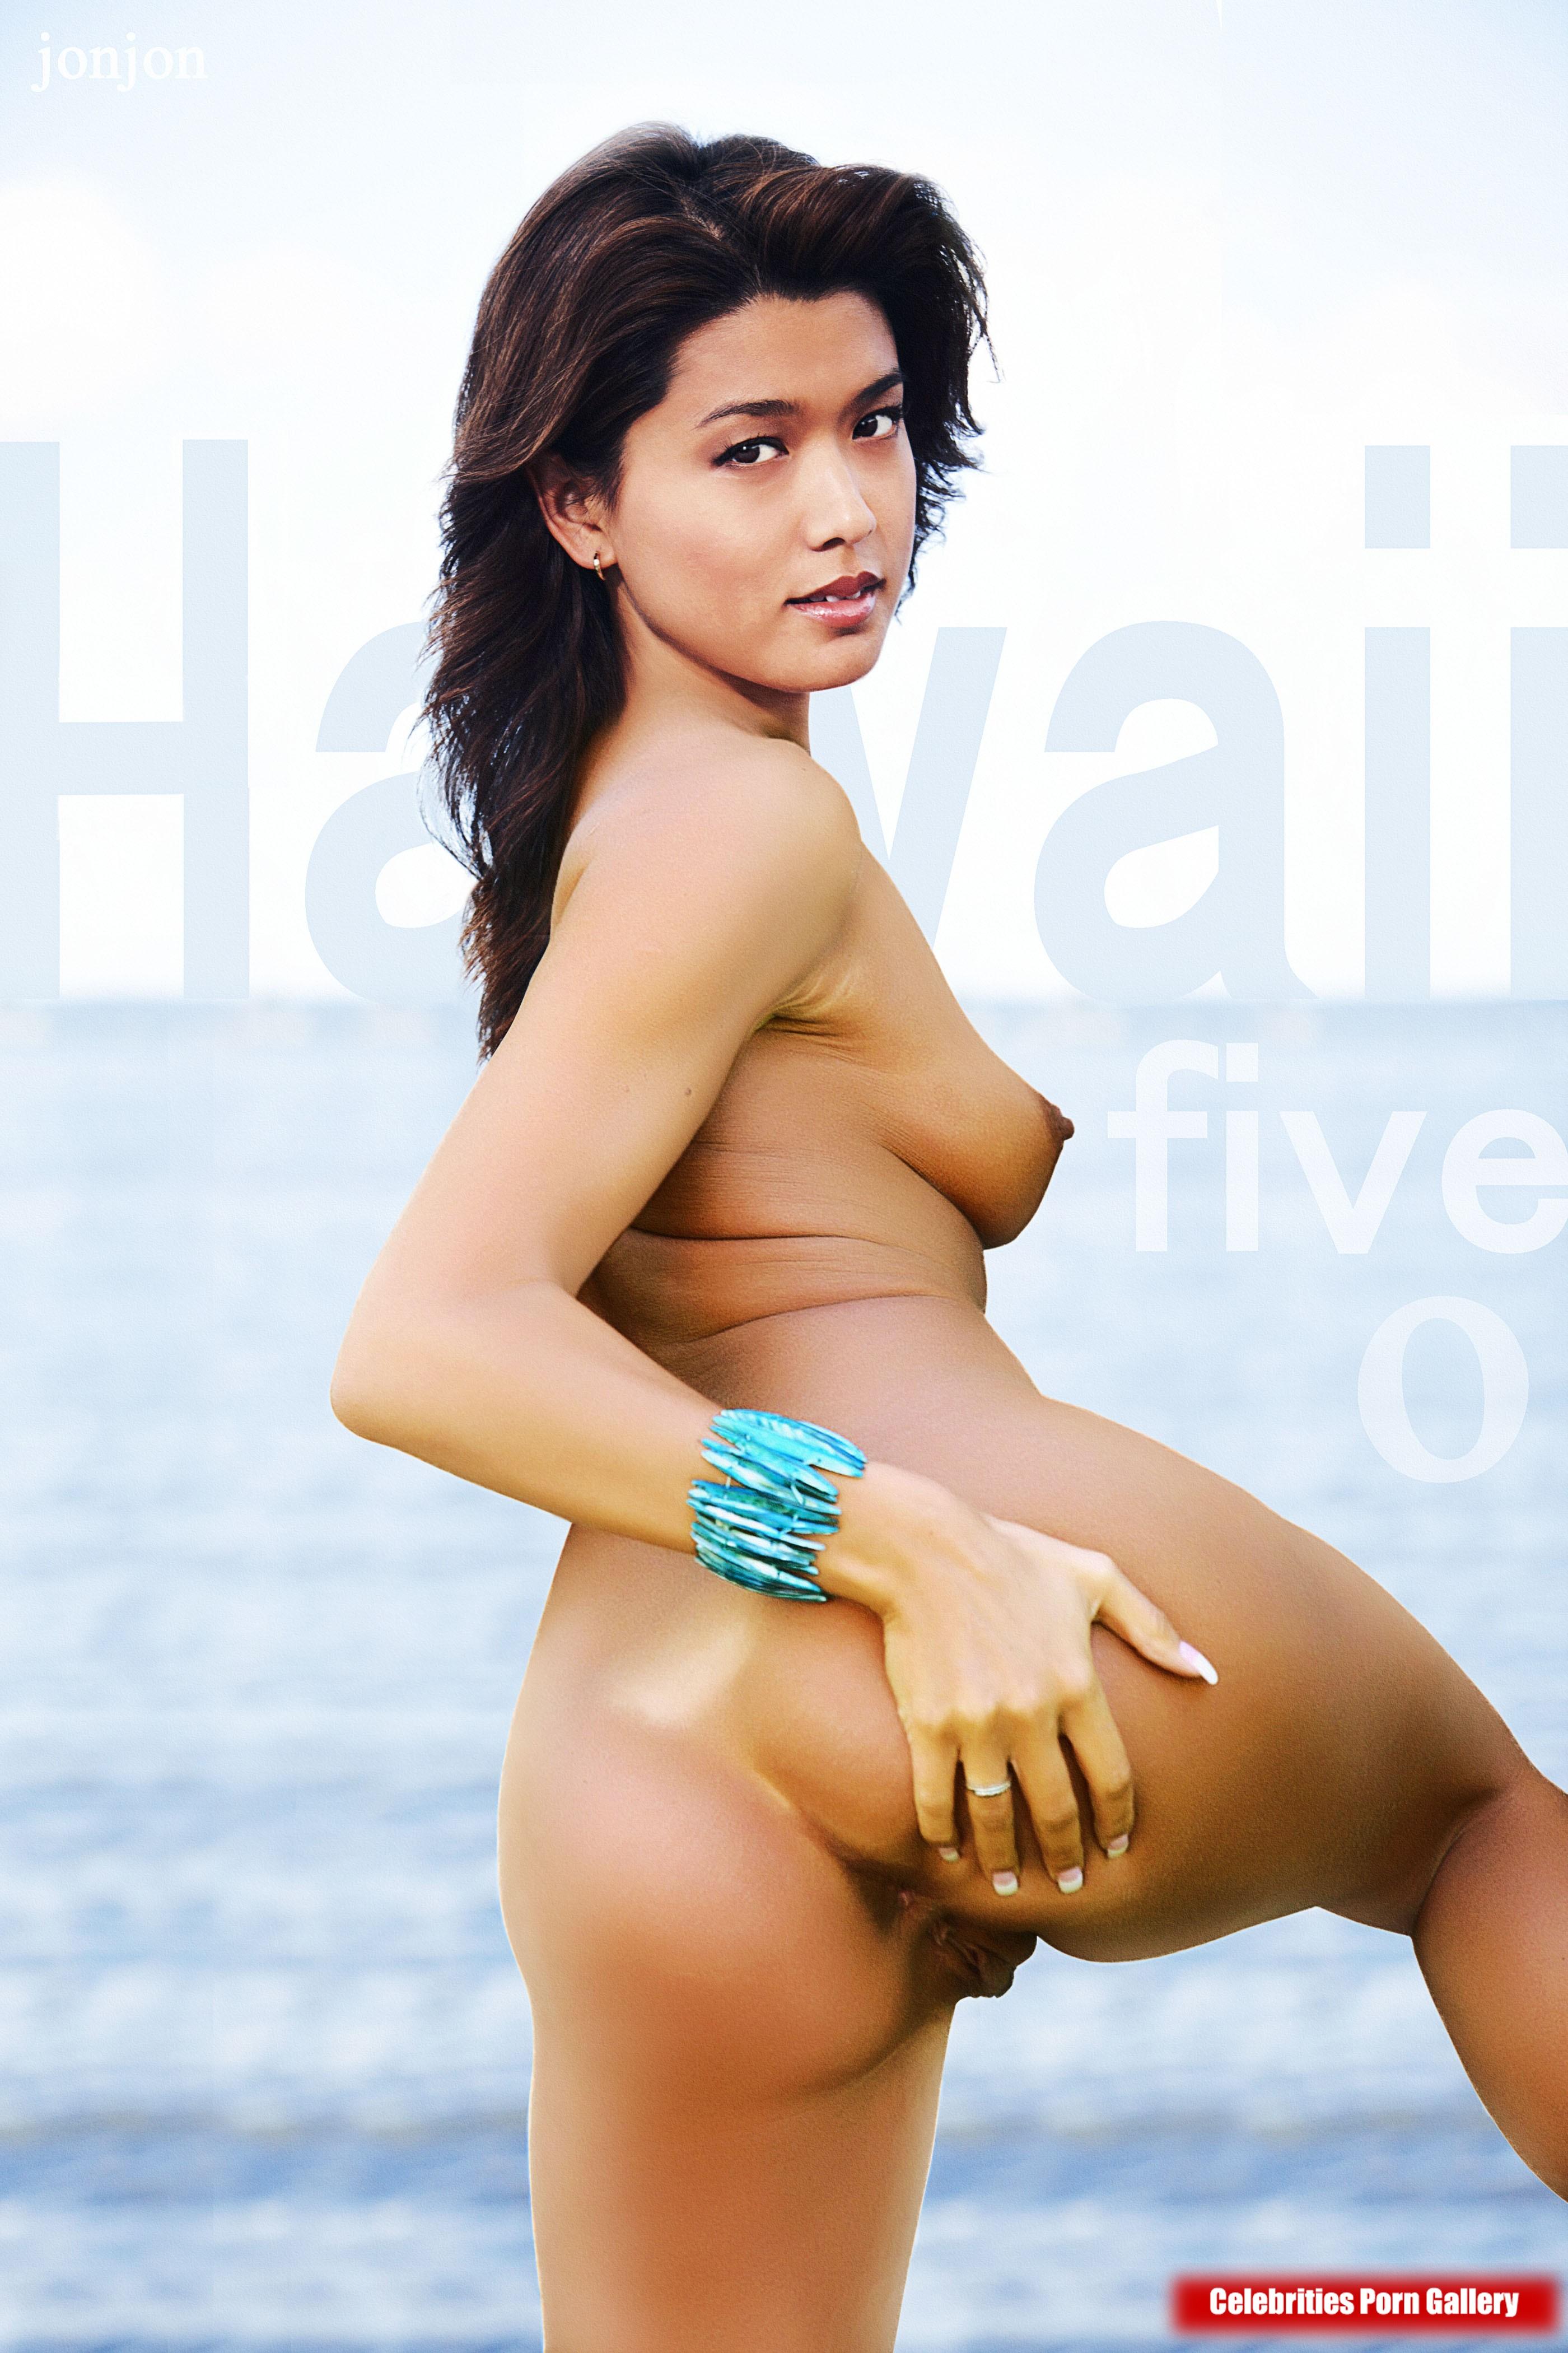 Hot celeb porn